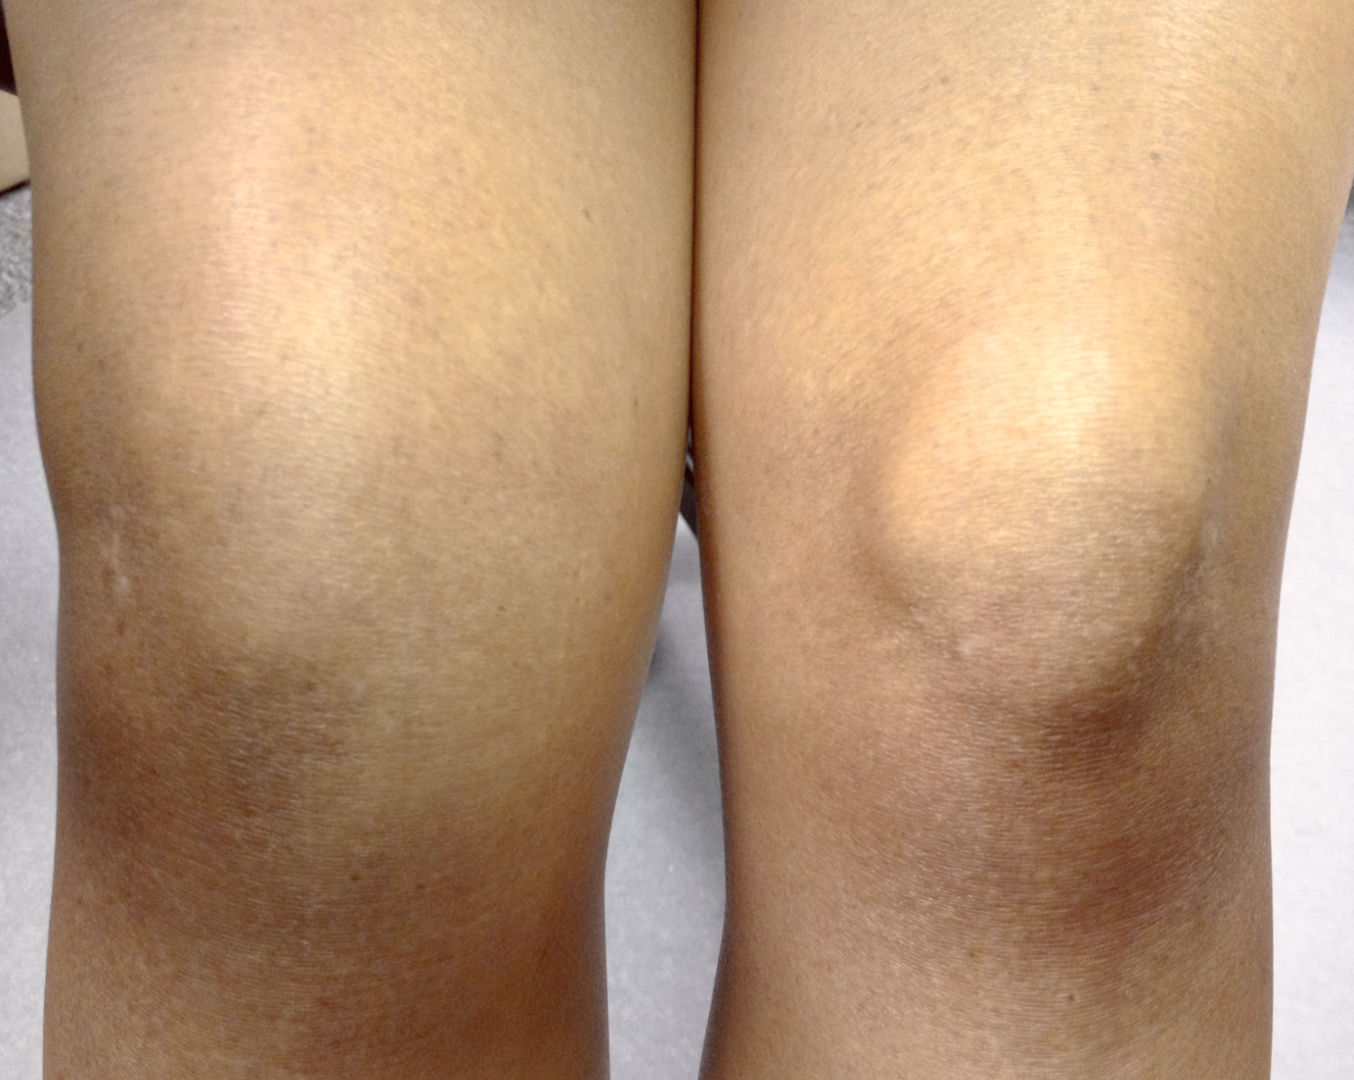 Припухло колено и болит при сгибании